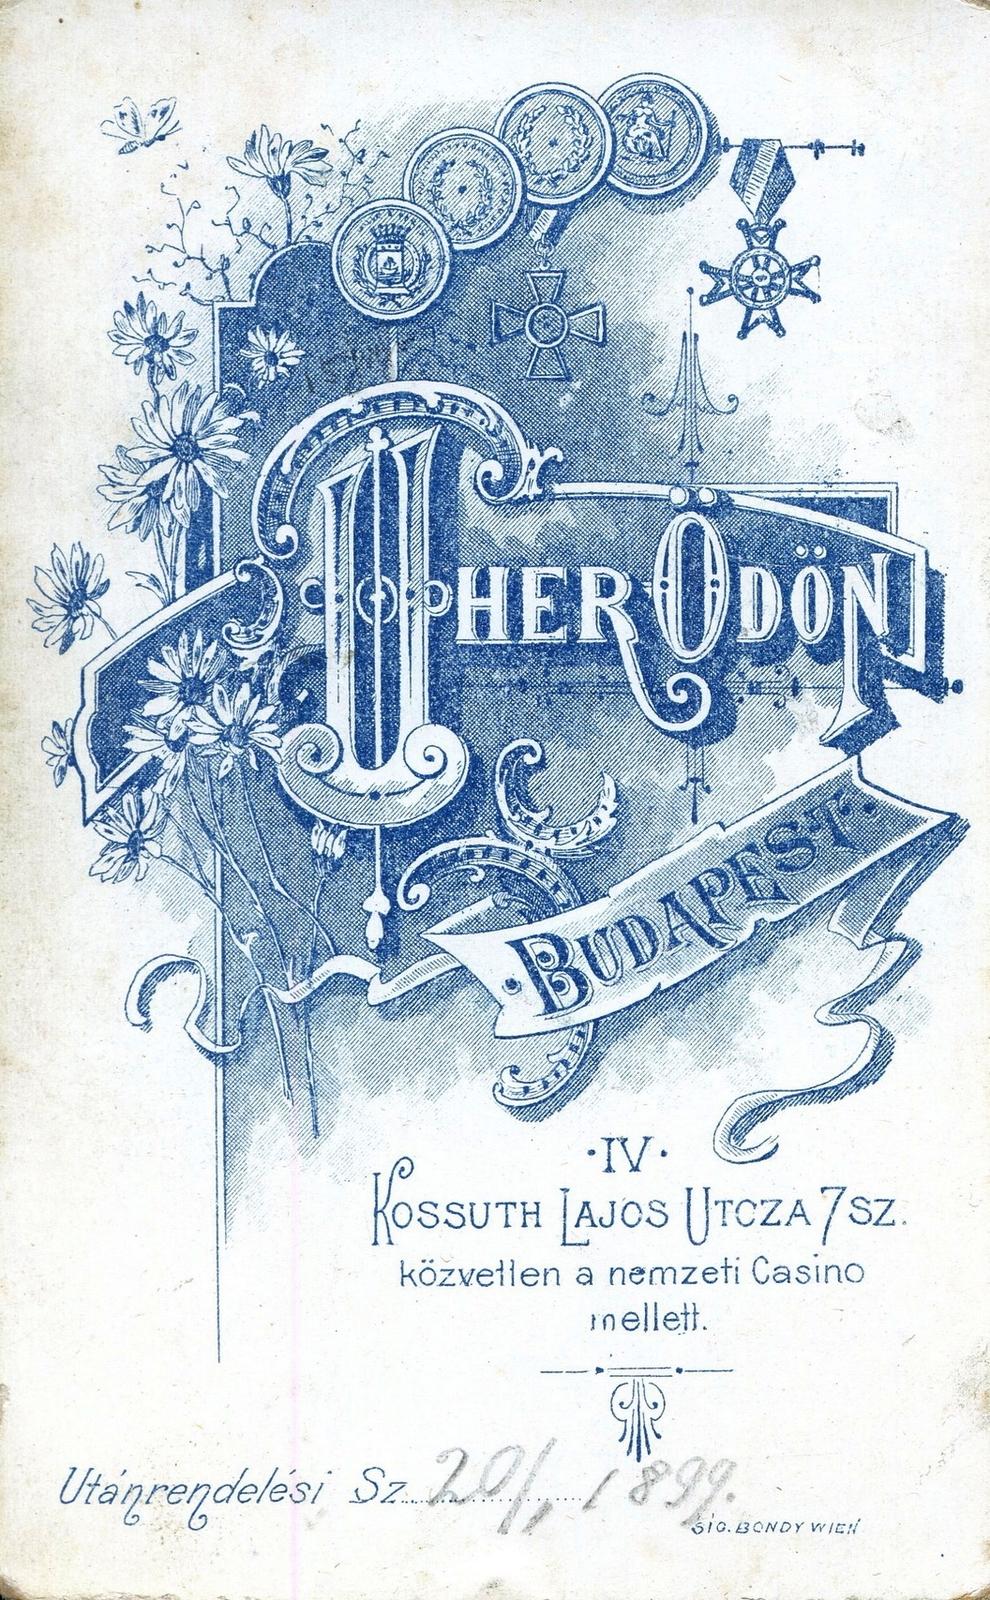 Uher Ödön műterme, Kossuth Lajos utca, 1899. Fortepan, 90403. Adományozó: Mészöly Leonóra https://fortepan.hu/hu/photos/?id=90403